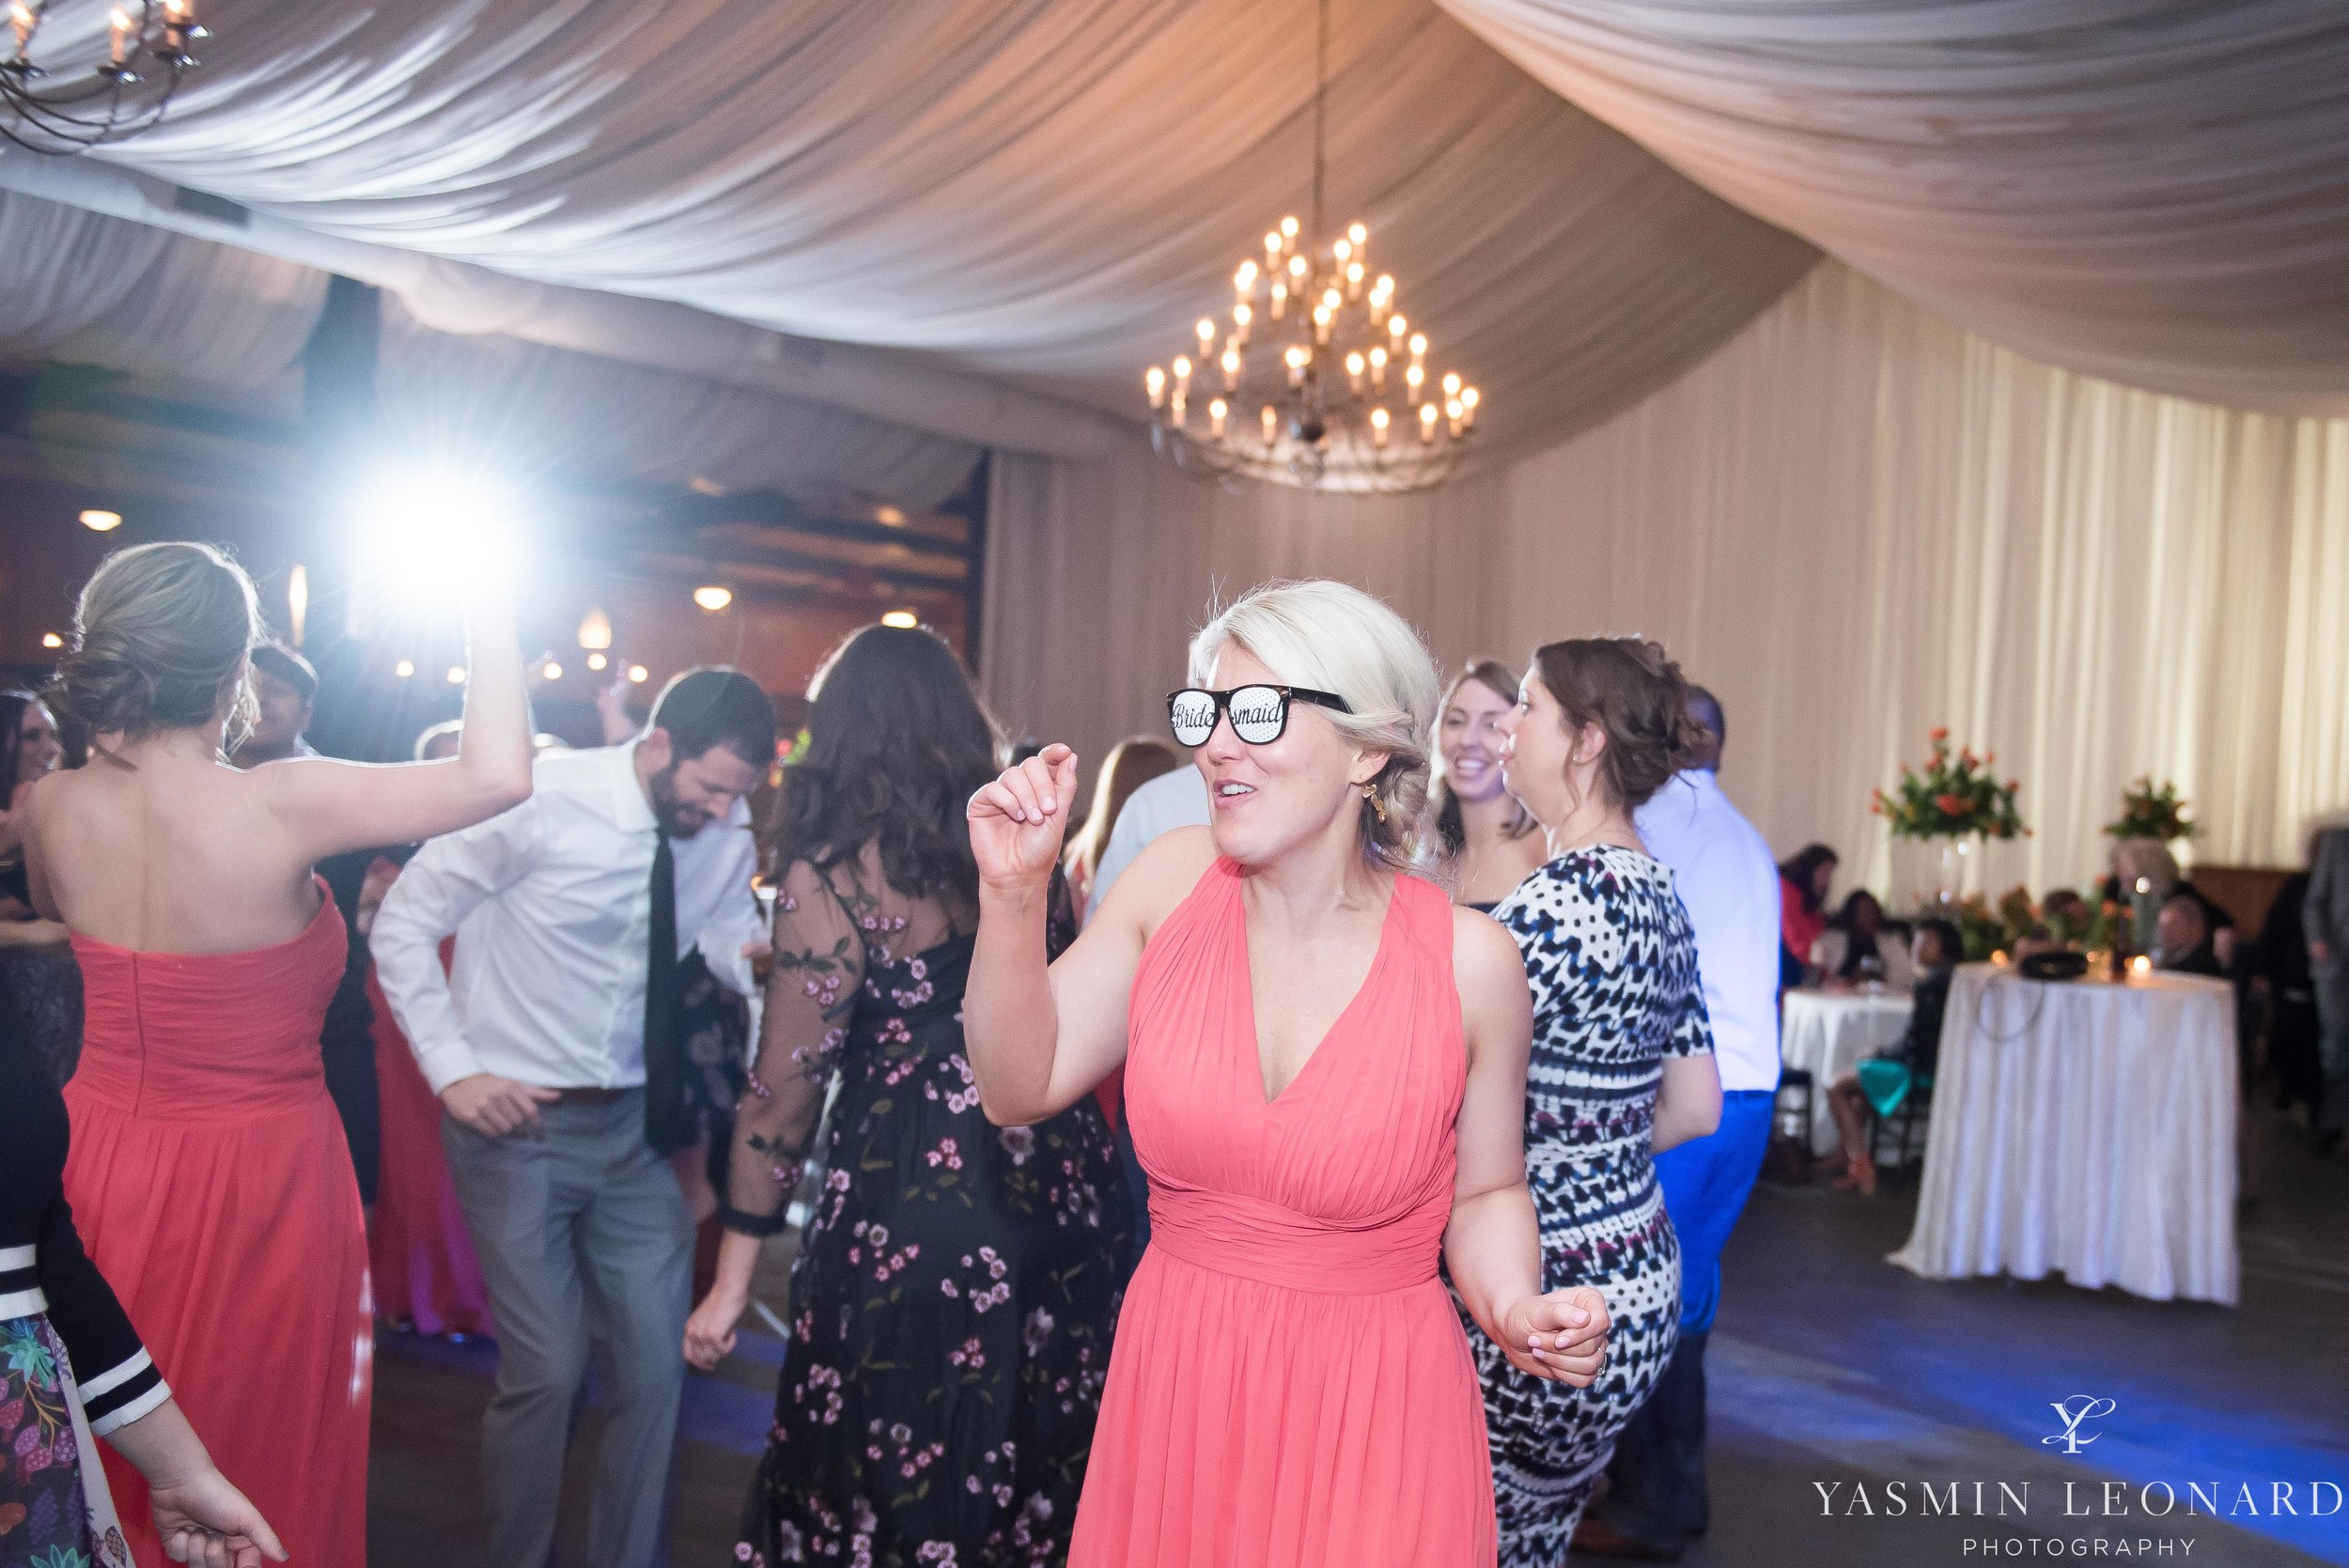 Adaumont Farm - Adaumont Farm Weddings - Trinity Weddings - NC Weddings - Yasmin Leonard Photography-86.jpg